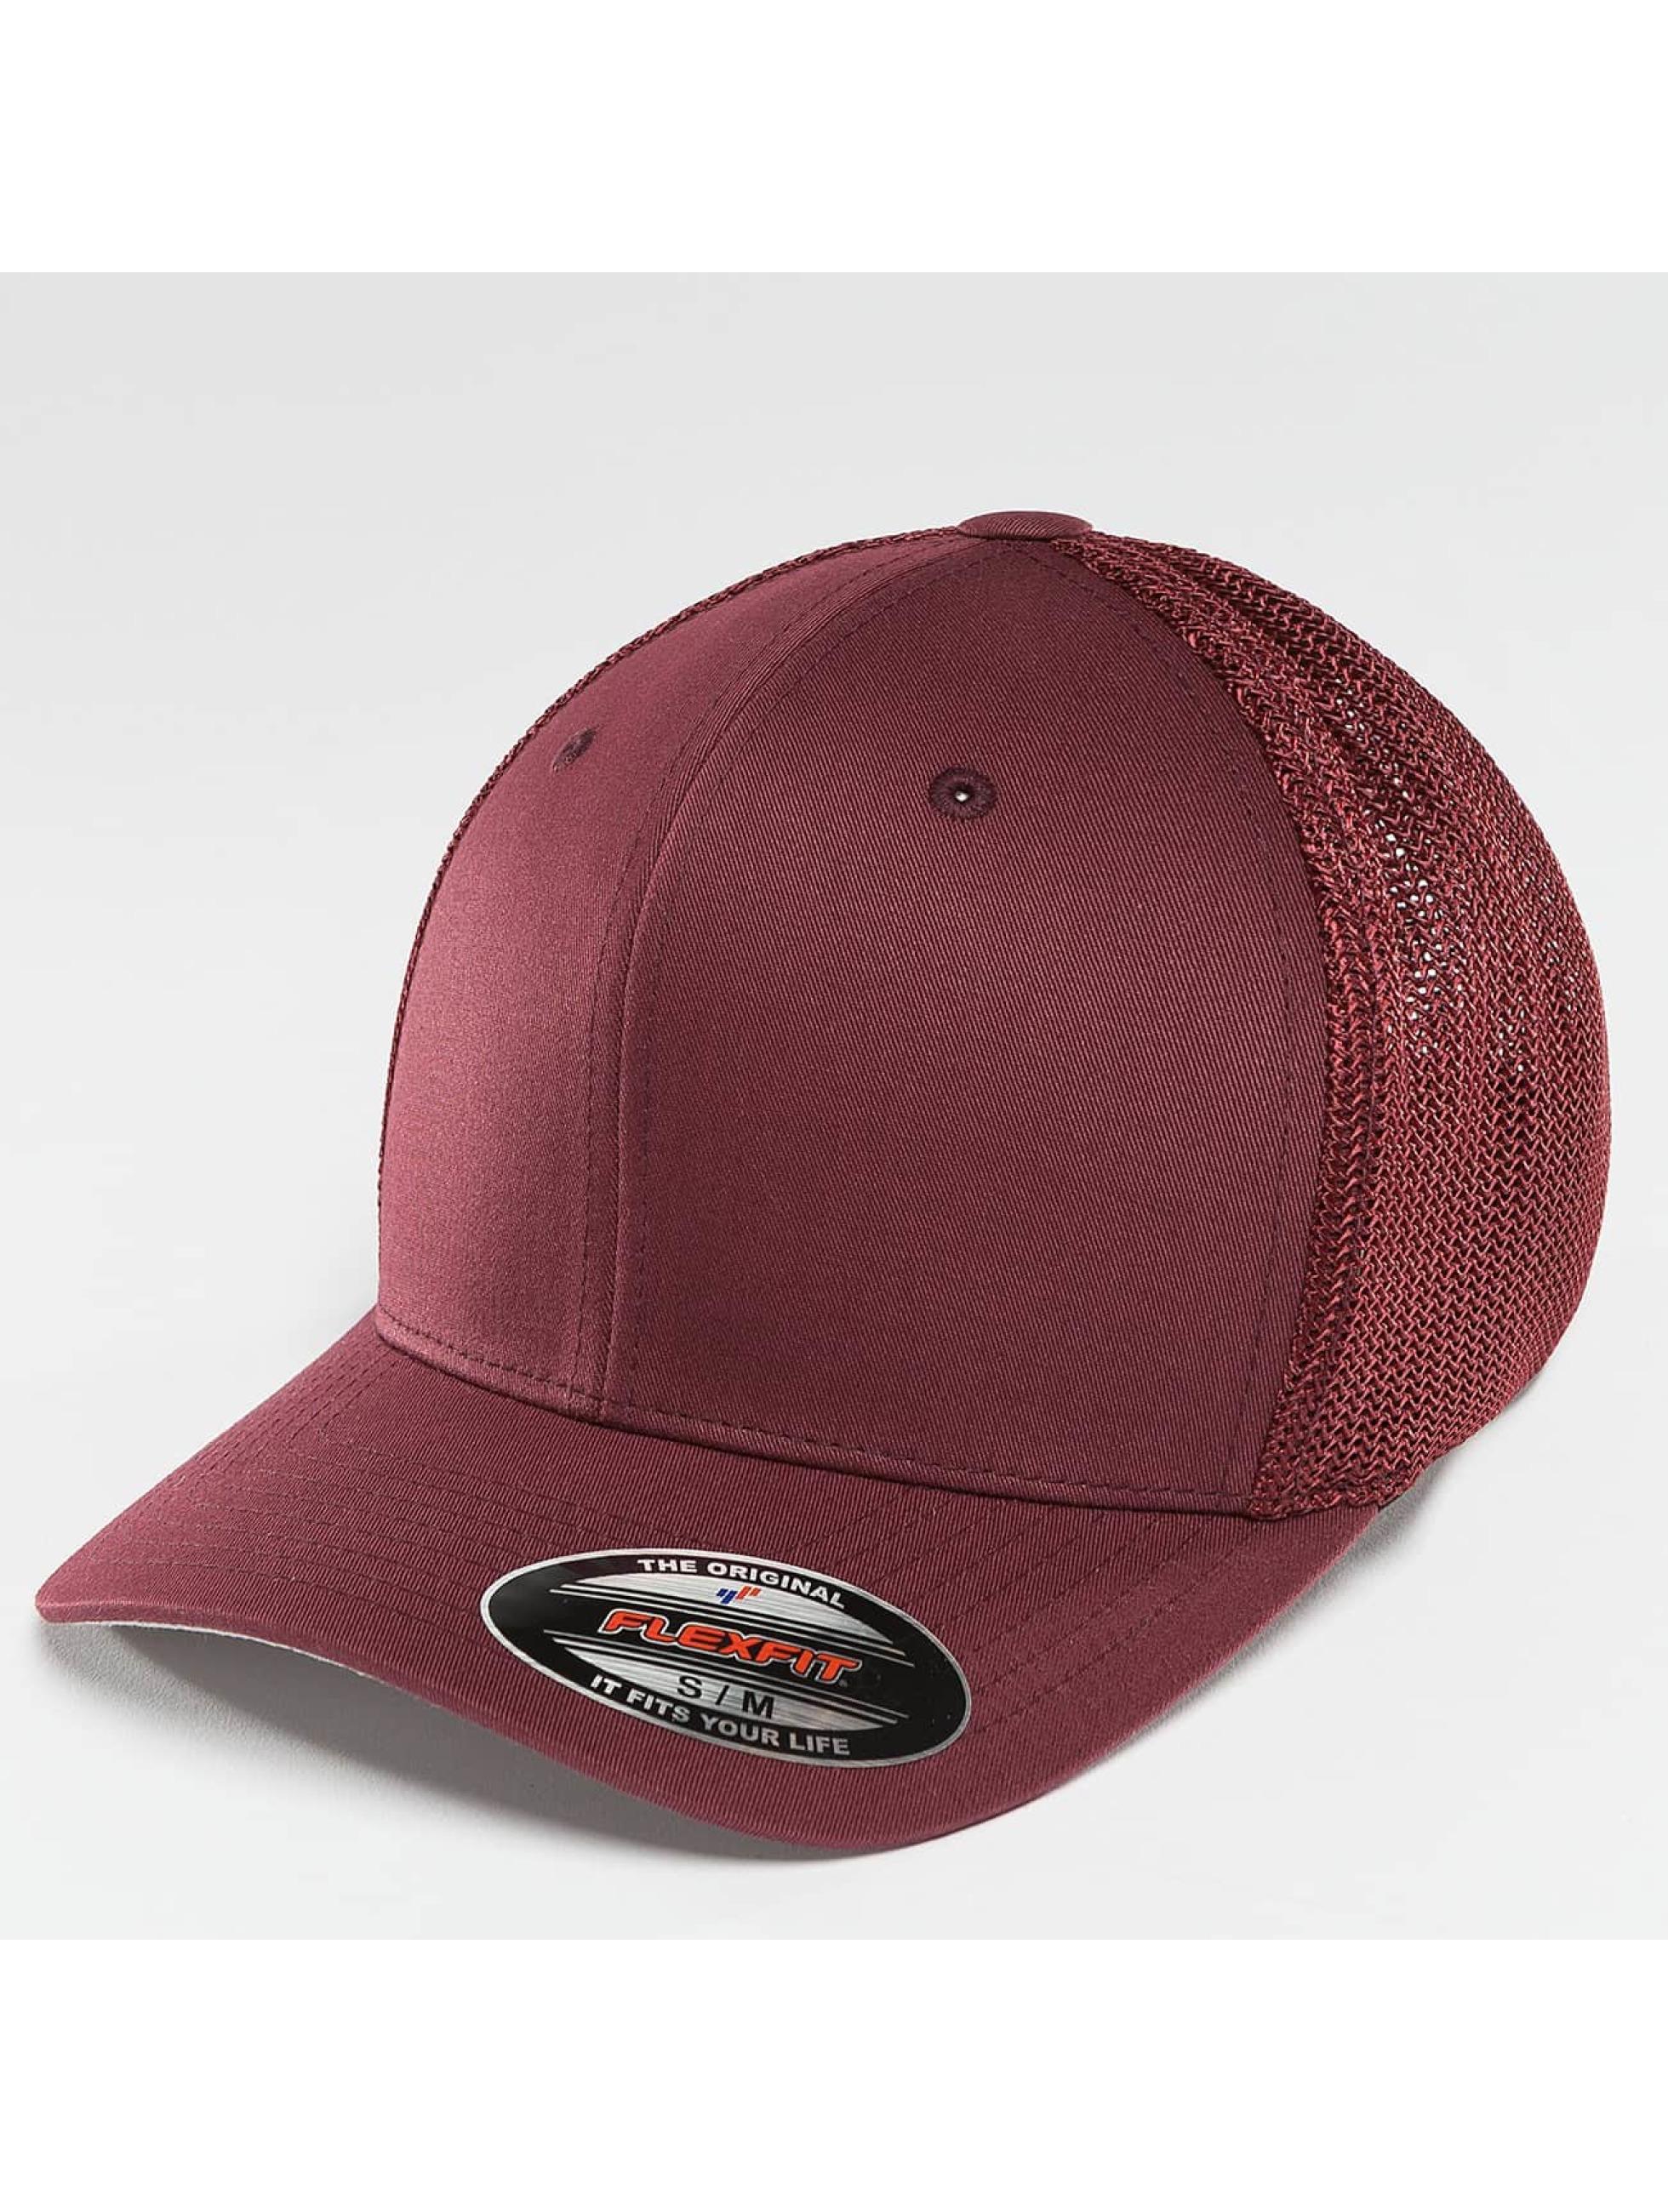 Flexfit Flexfitted Cap Mesh Cotton Twill rojo